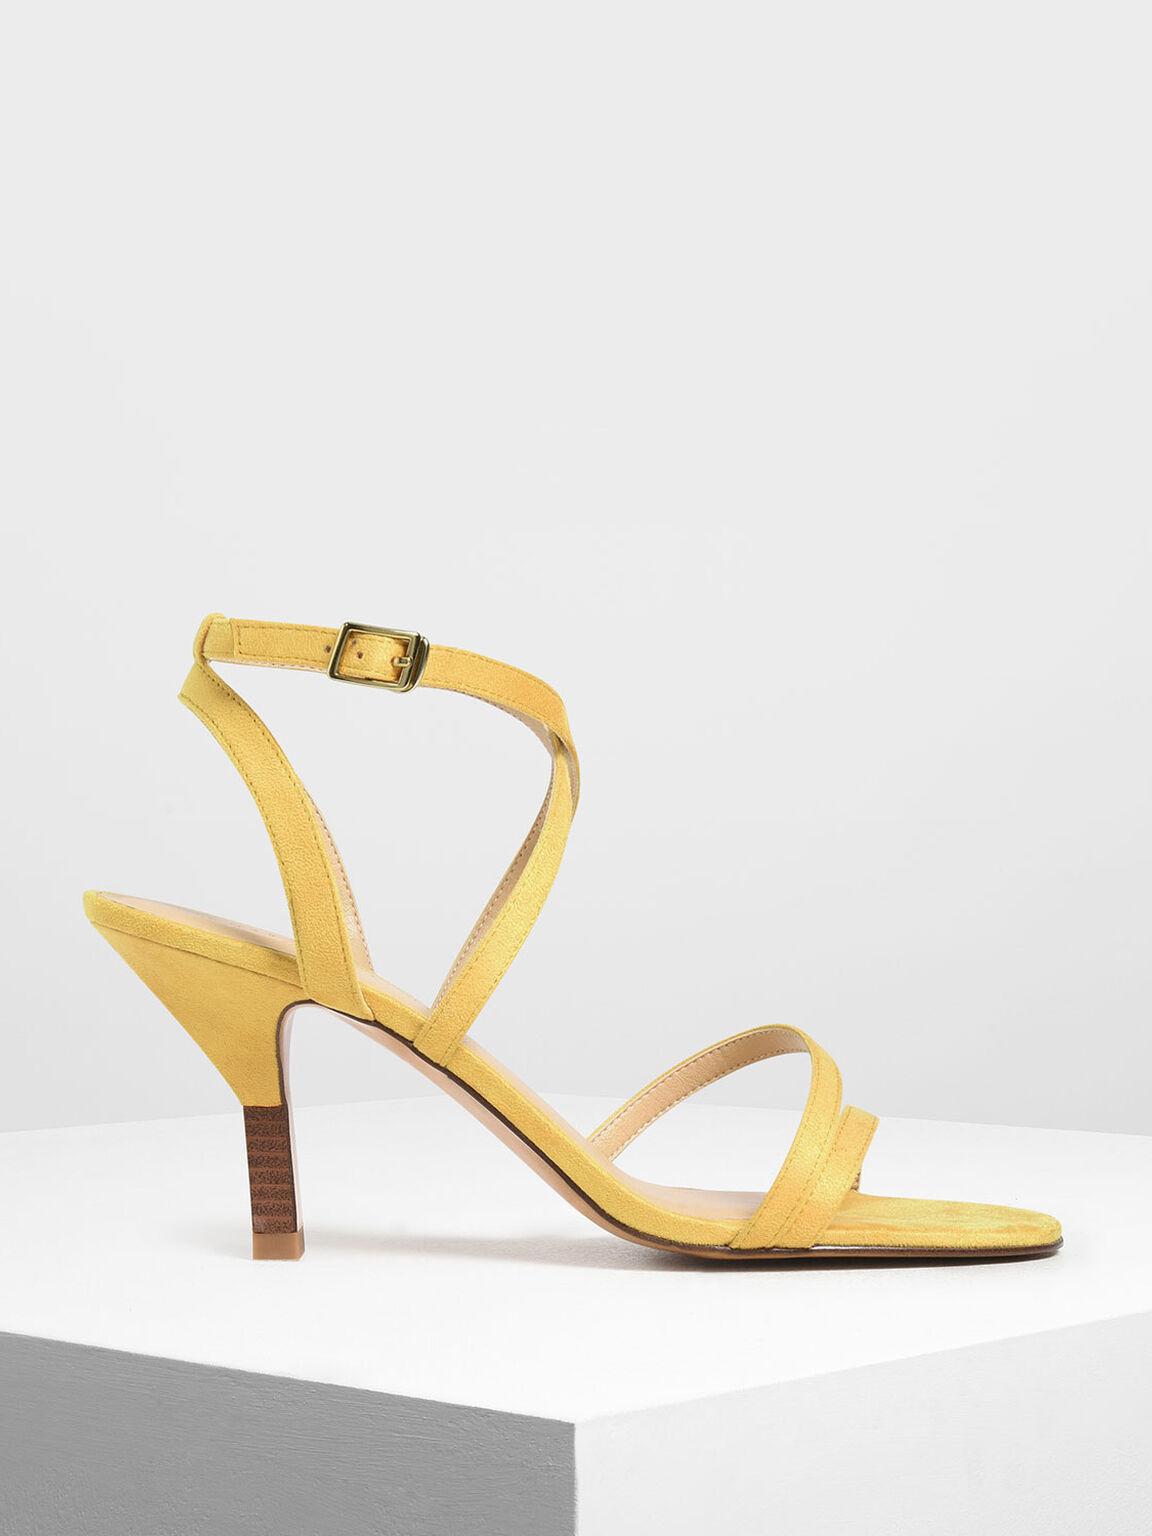 Strappy Blade Heel Sandals, Mustard, hi-res